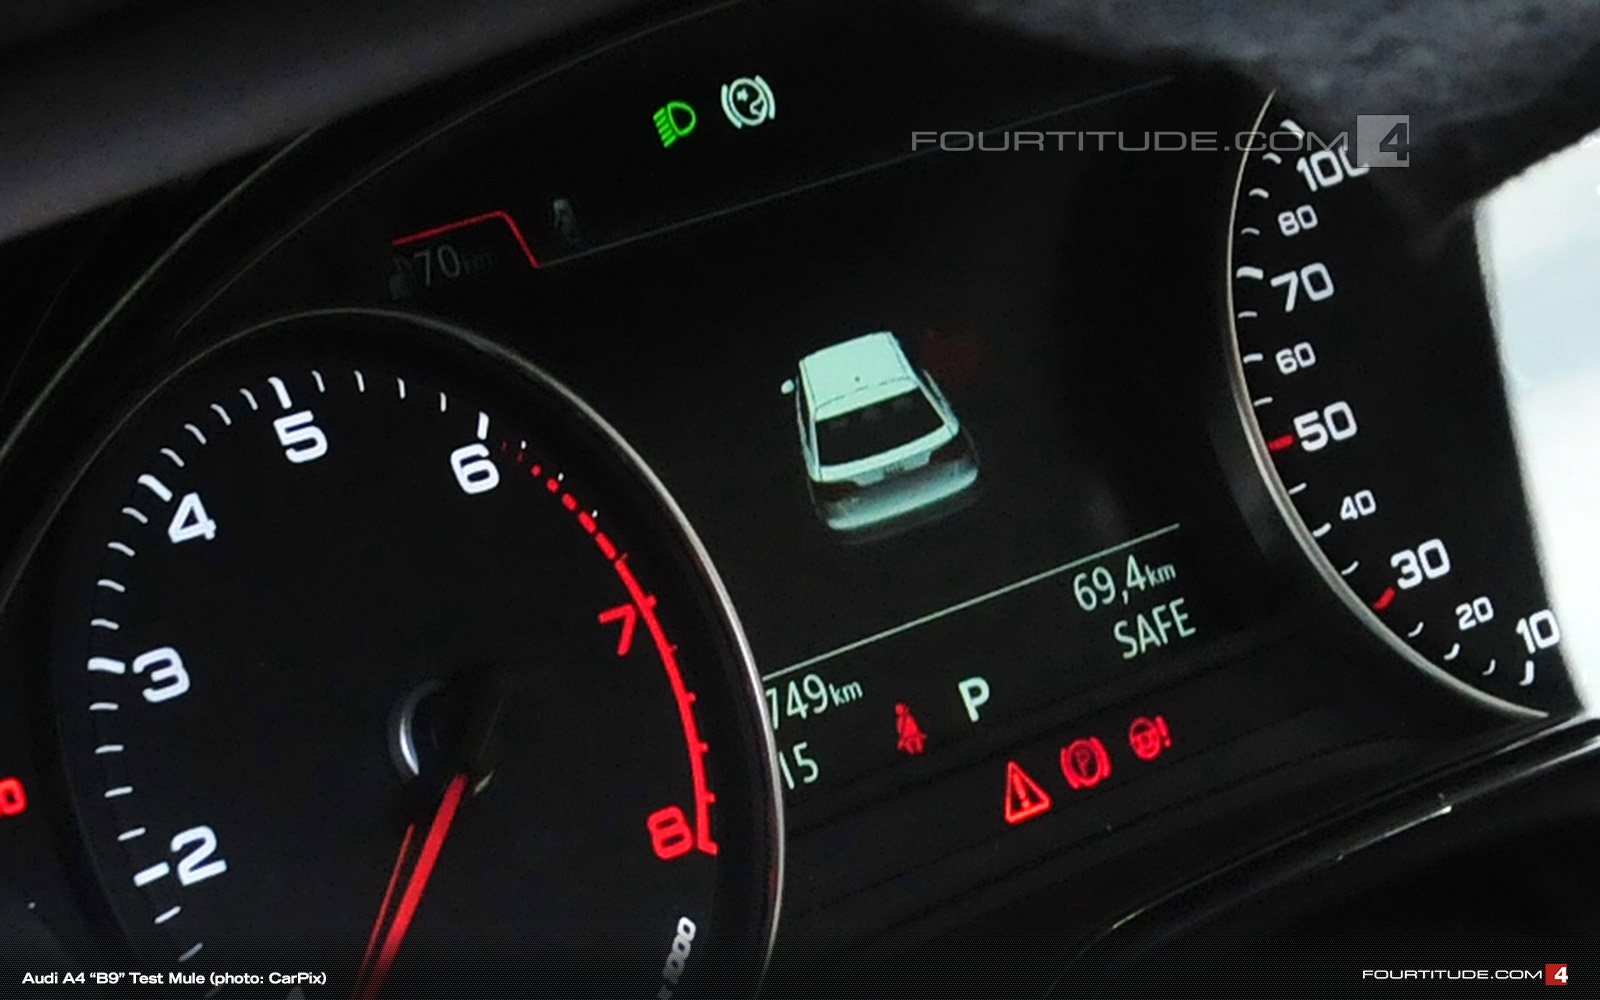 Nuova Audi A4 2016 Avvistati I Nuovi Interni Audicafe It